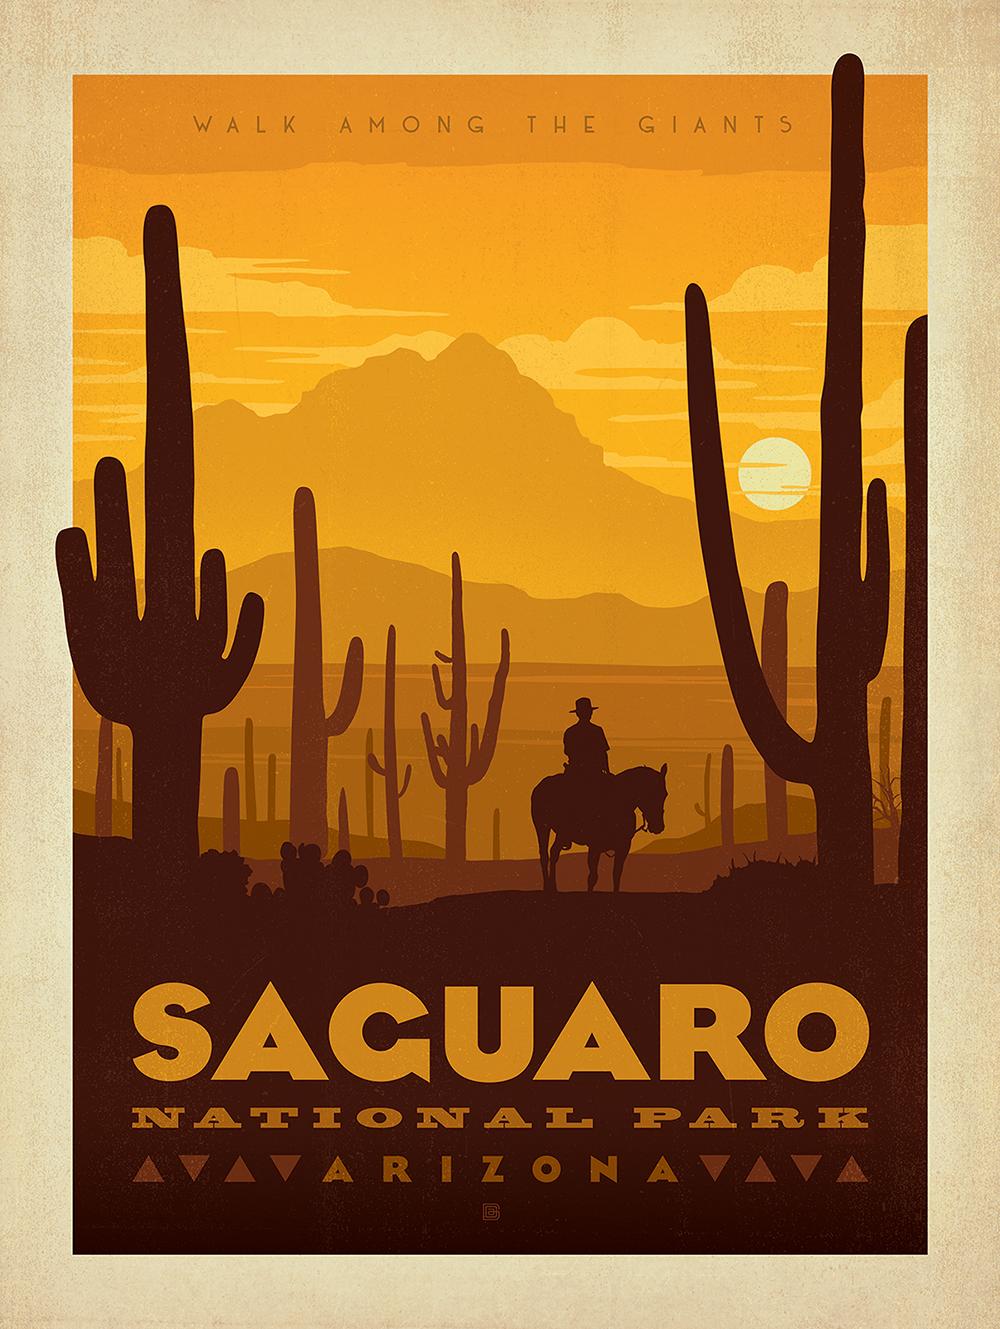 National Park no. 52, Arizona, established in 1994